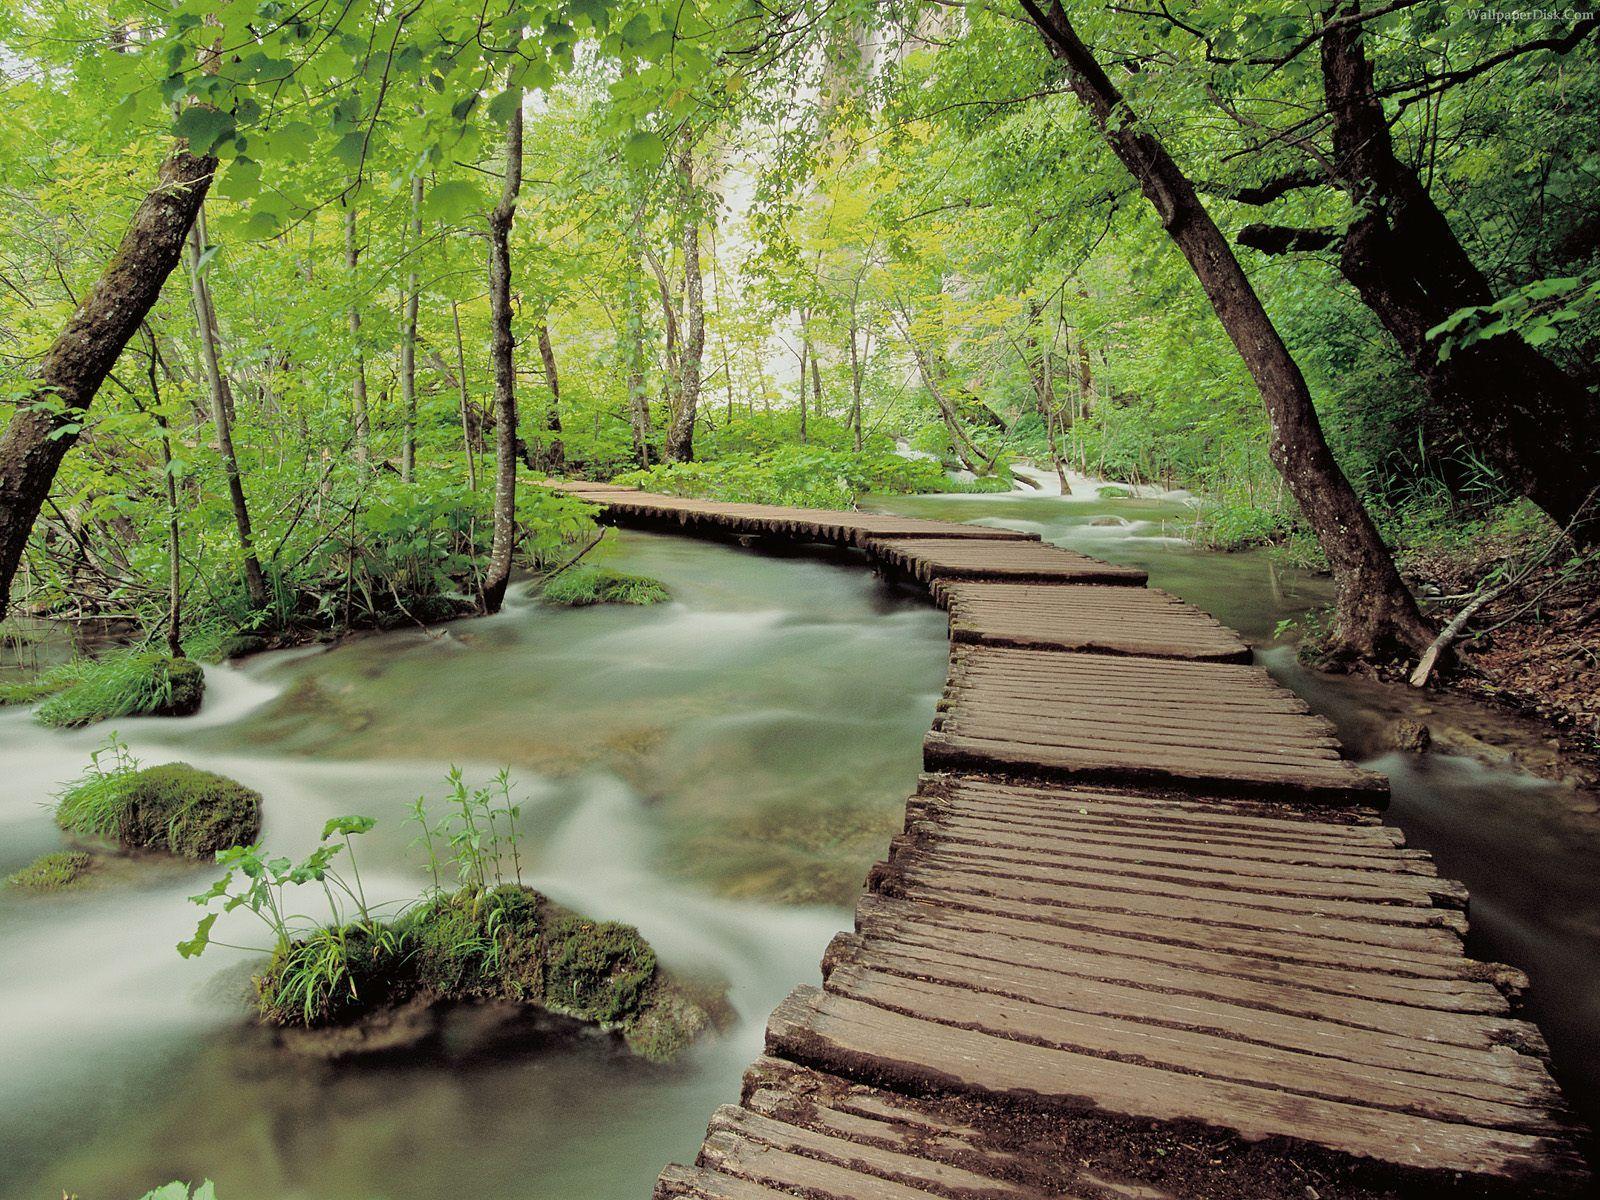 Green Natural Scene